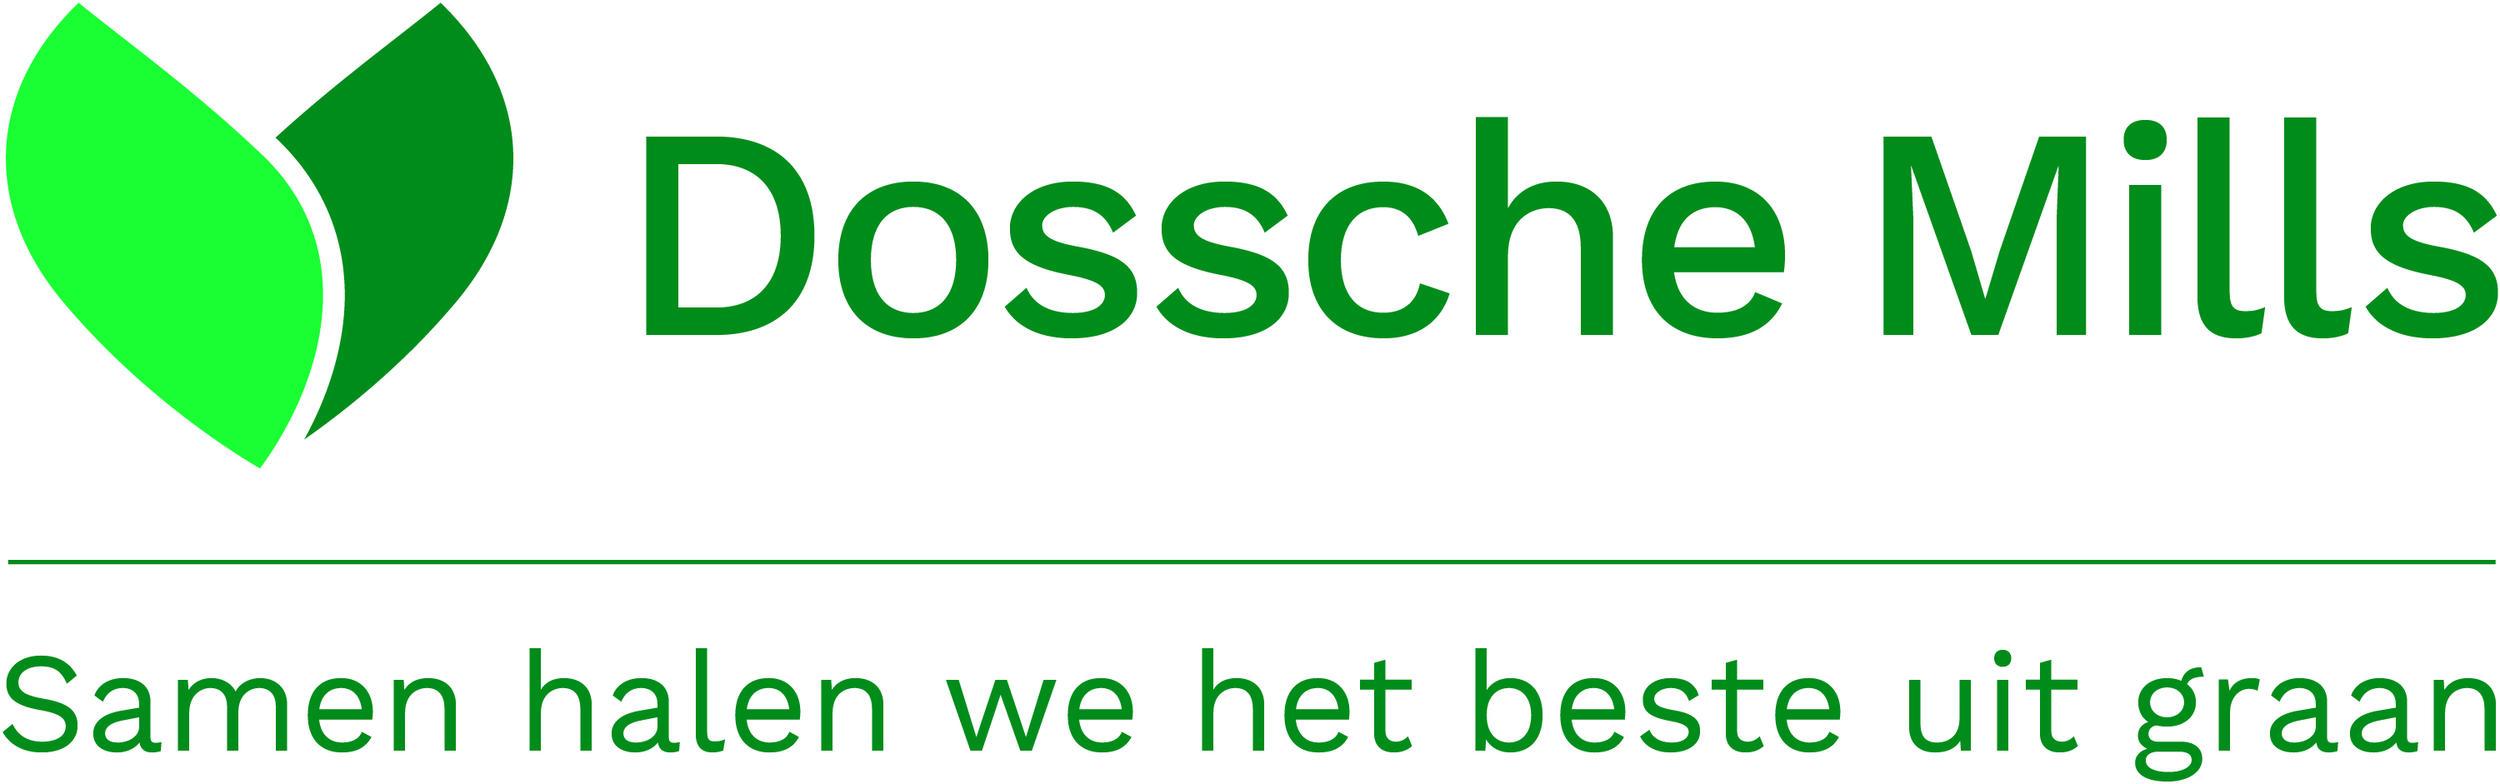 Dossche Mills partner Food Innovation Academy